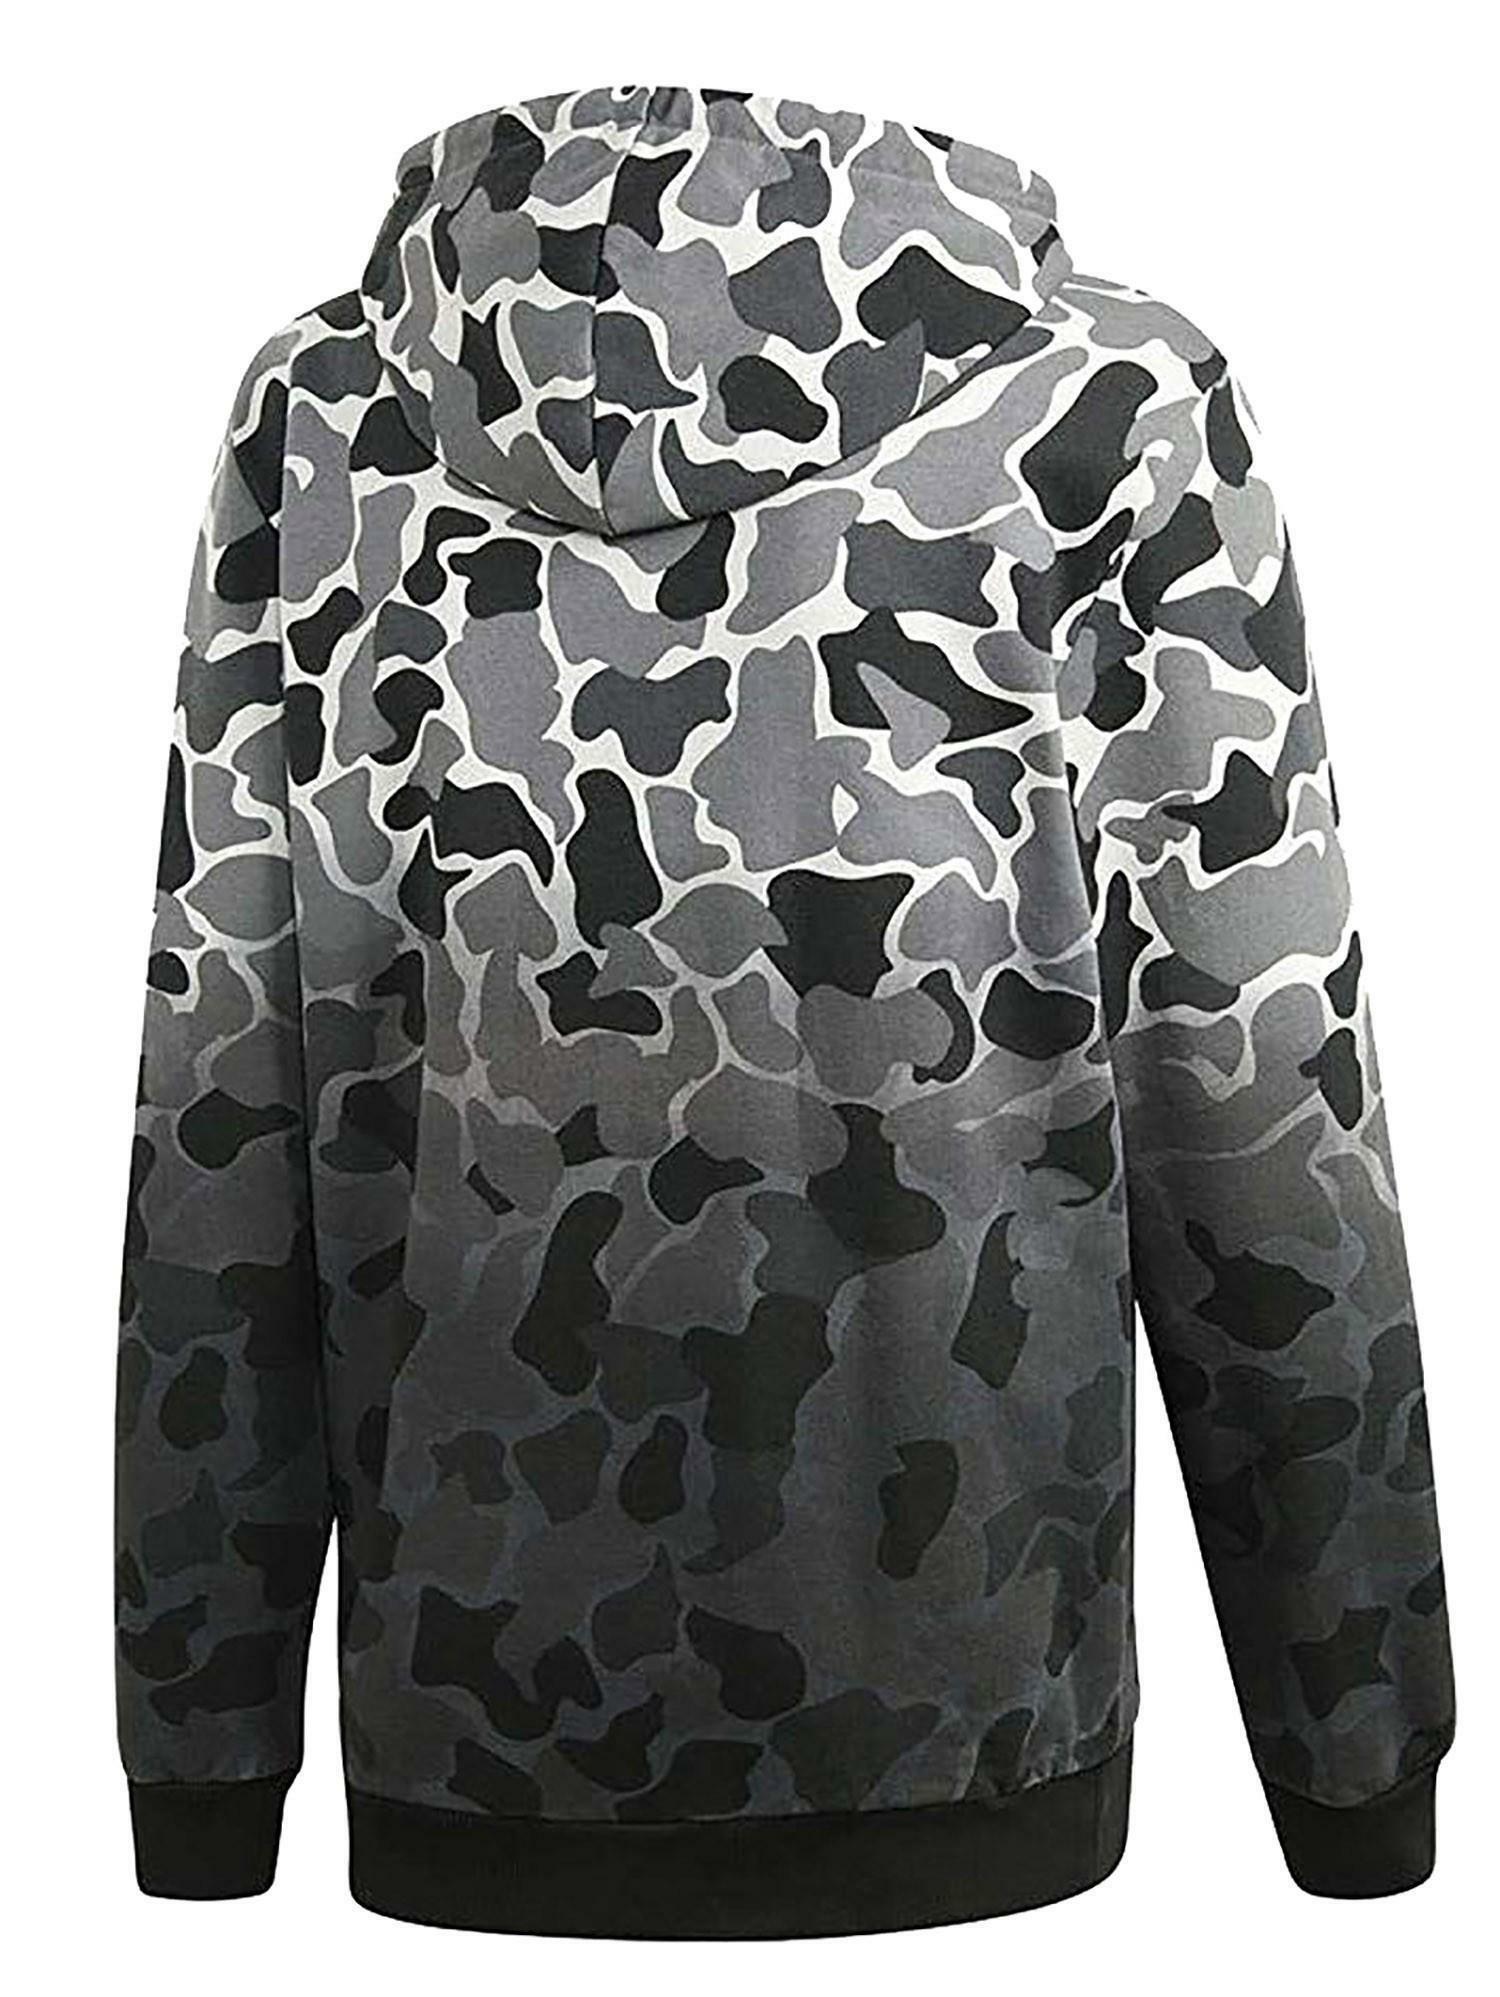 adidas adidas hoodie felpa uomo grigia camouflage dh4807